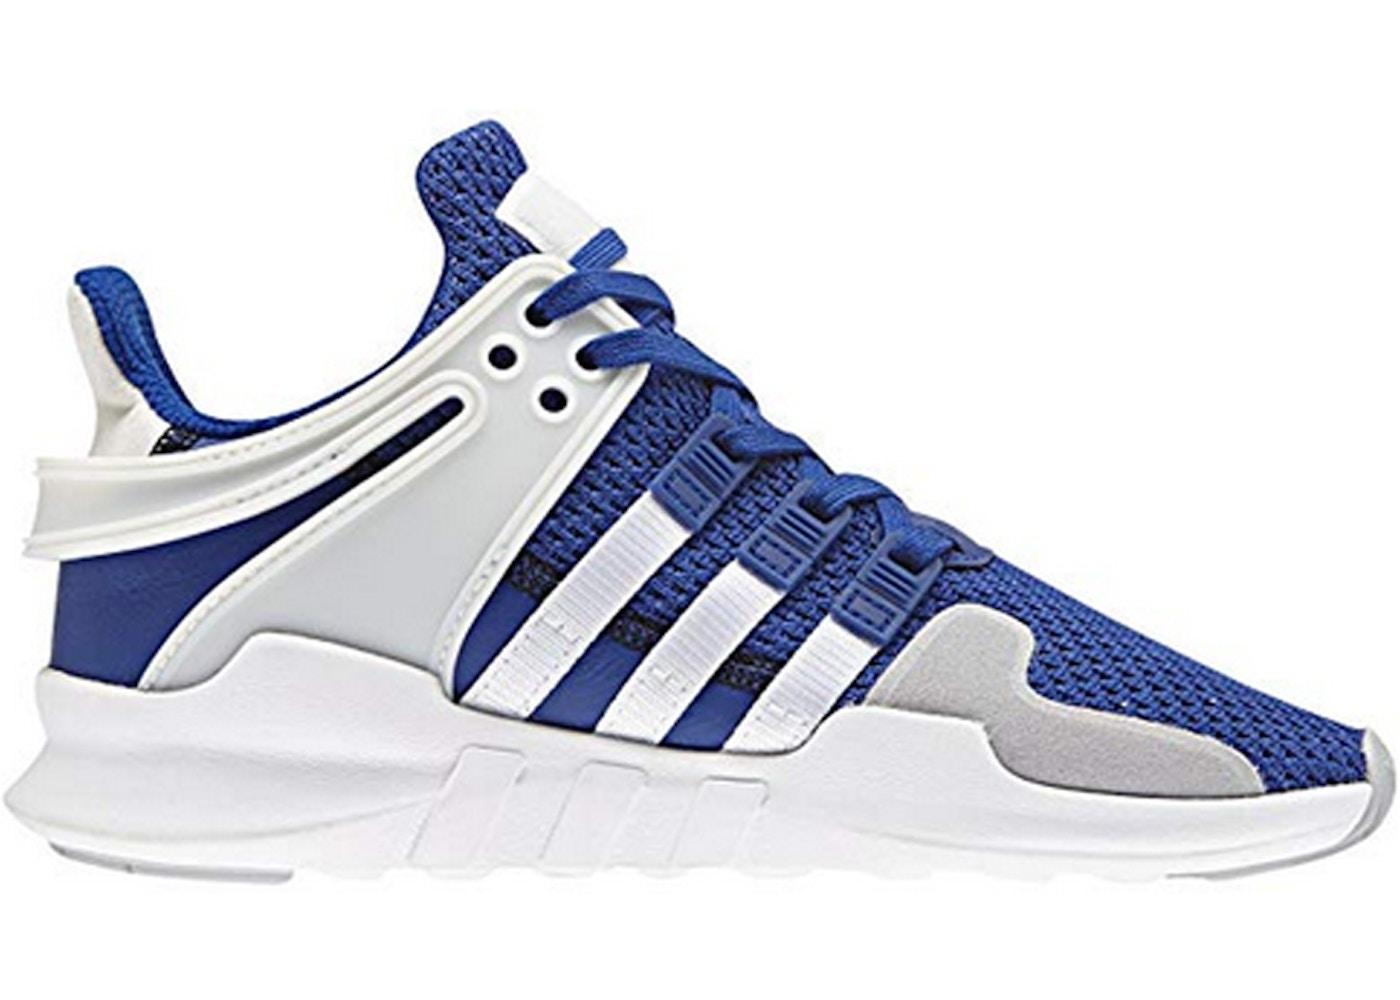 baño riñones Serrado  adidas EQT Support Adv Blue White (Youth) - CM8151